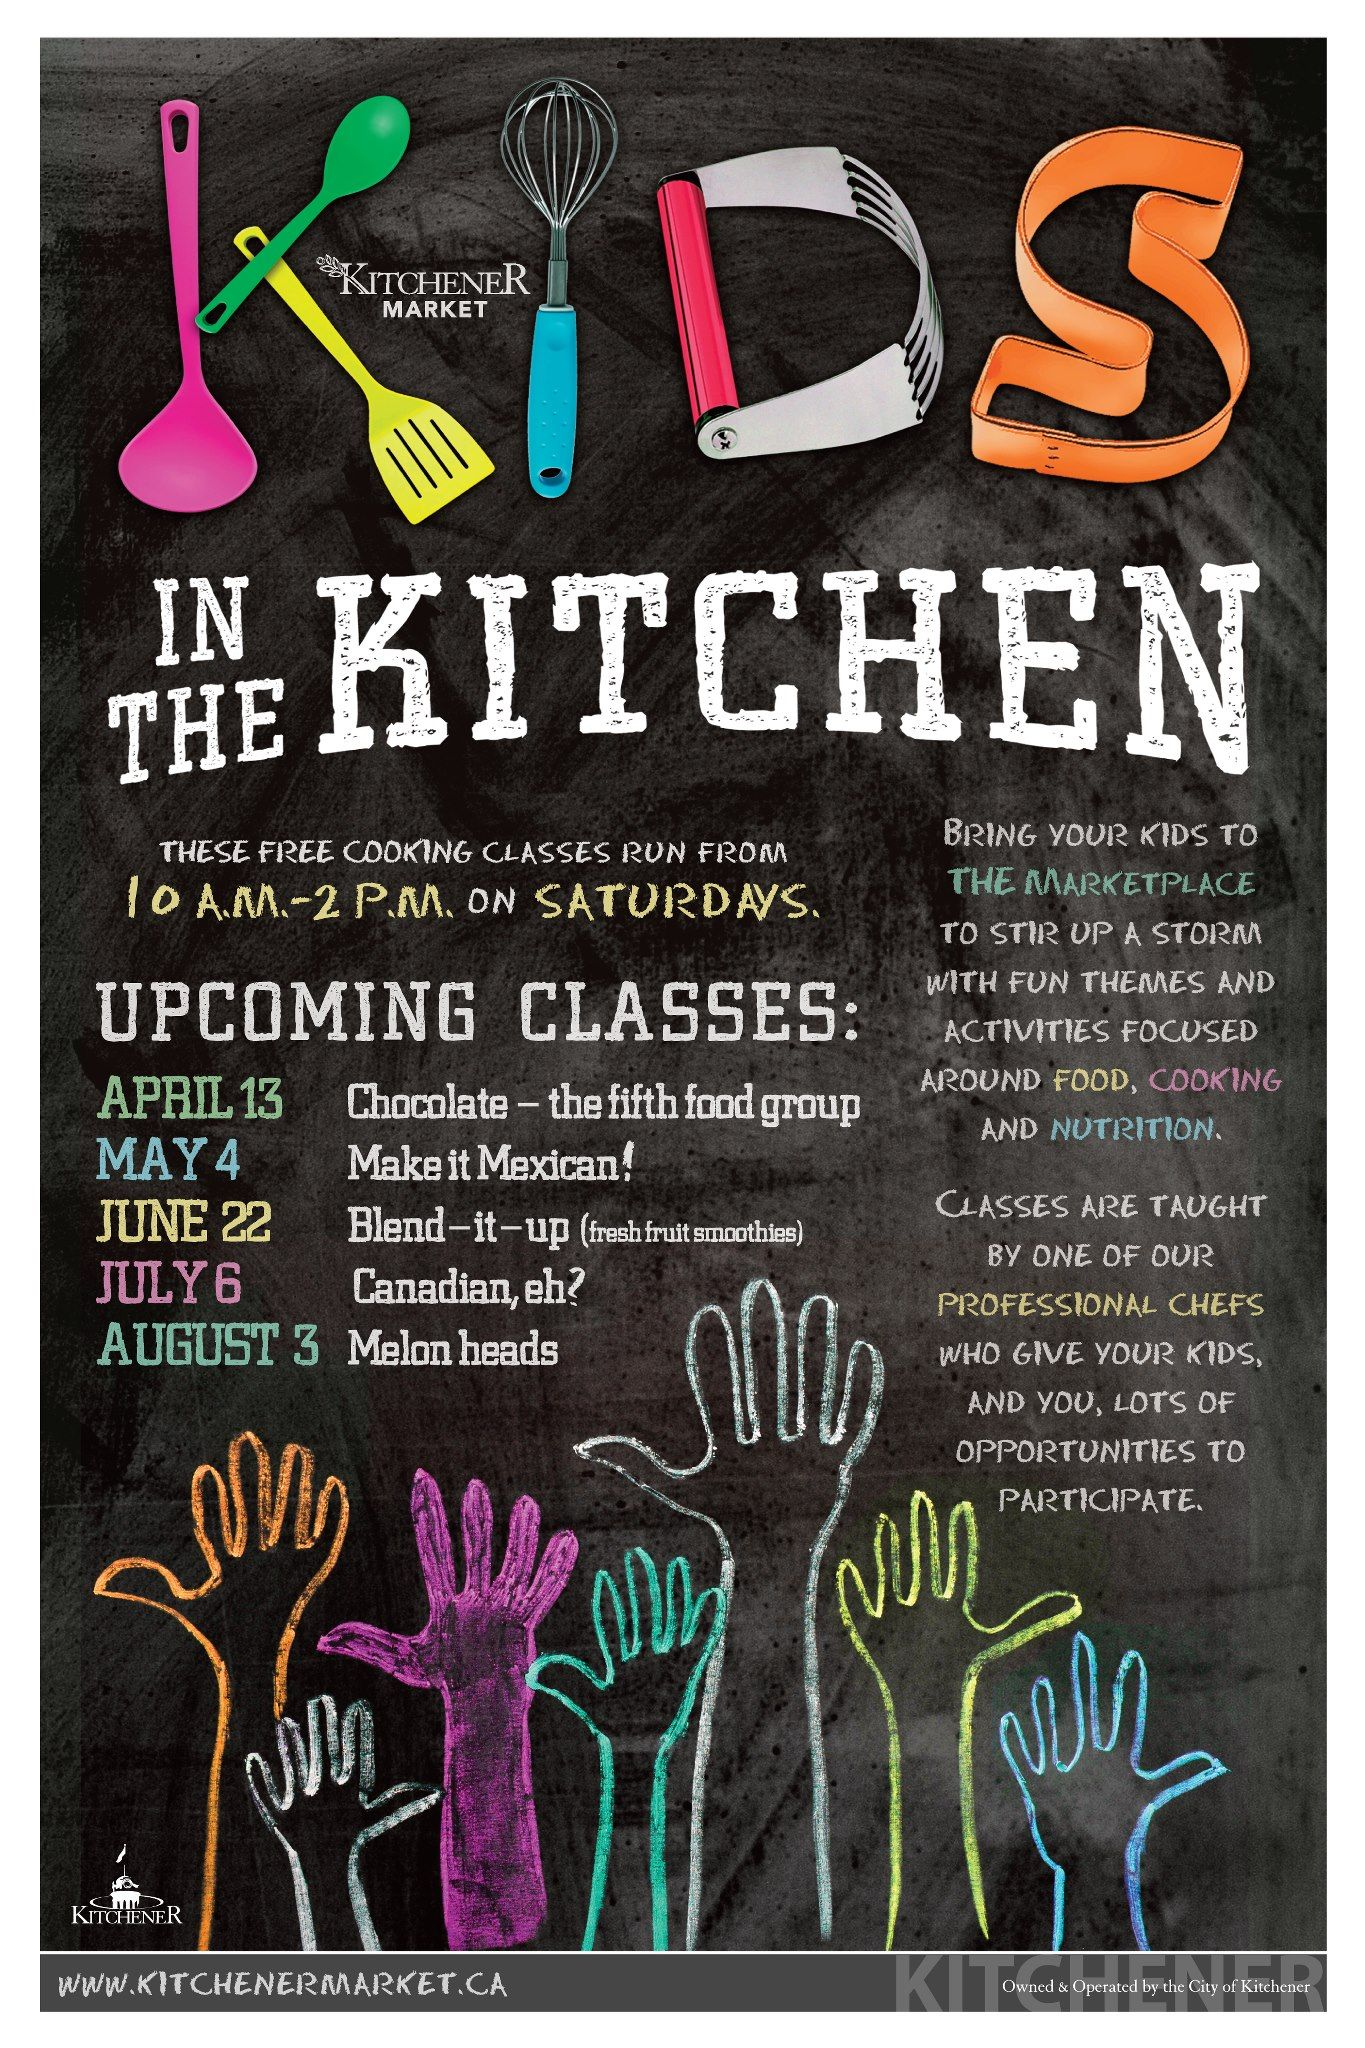 Free Kids Cooking Lesson Kitchener Market Cooking Classes For Kids Kids Cooking Lessons Cooking Classes Design